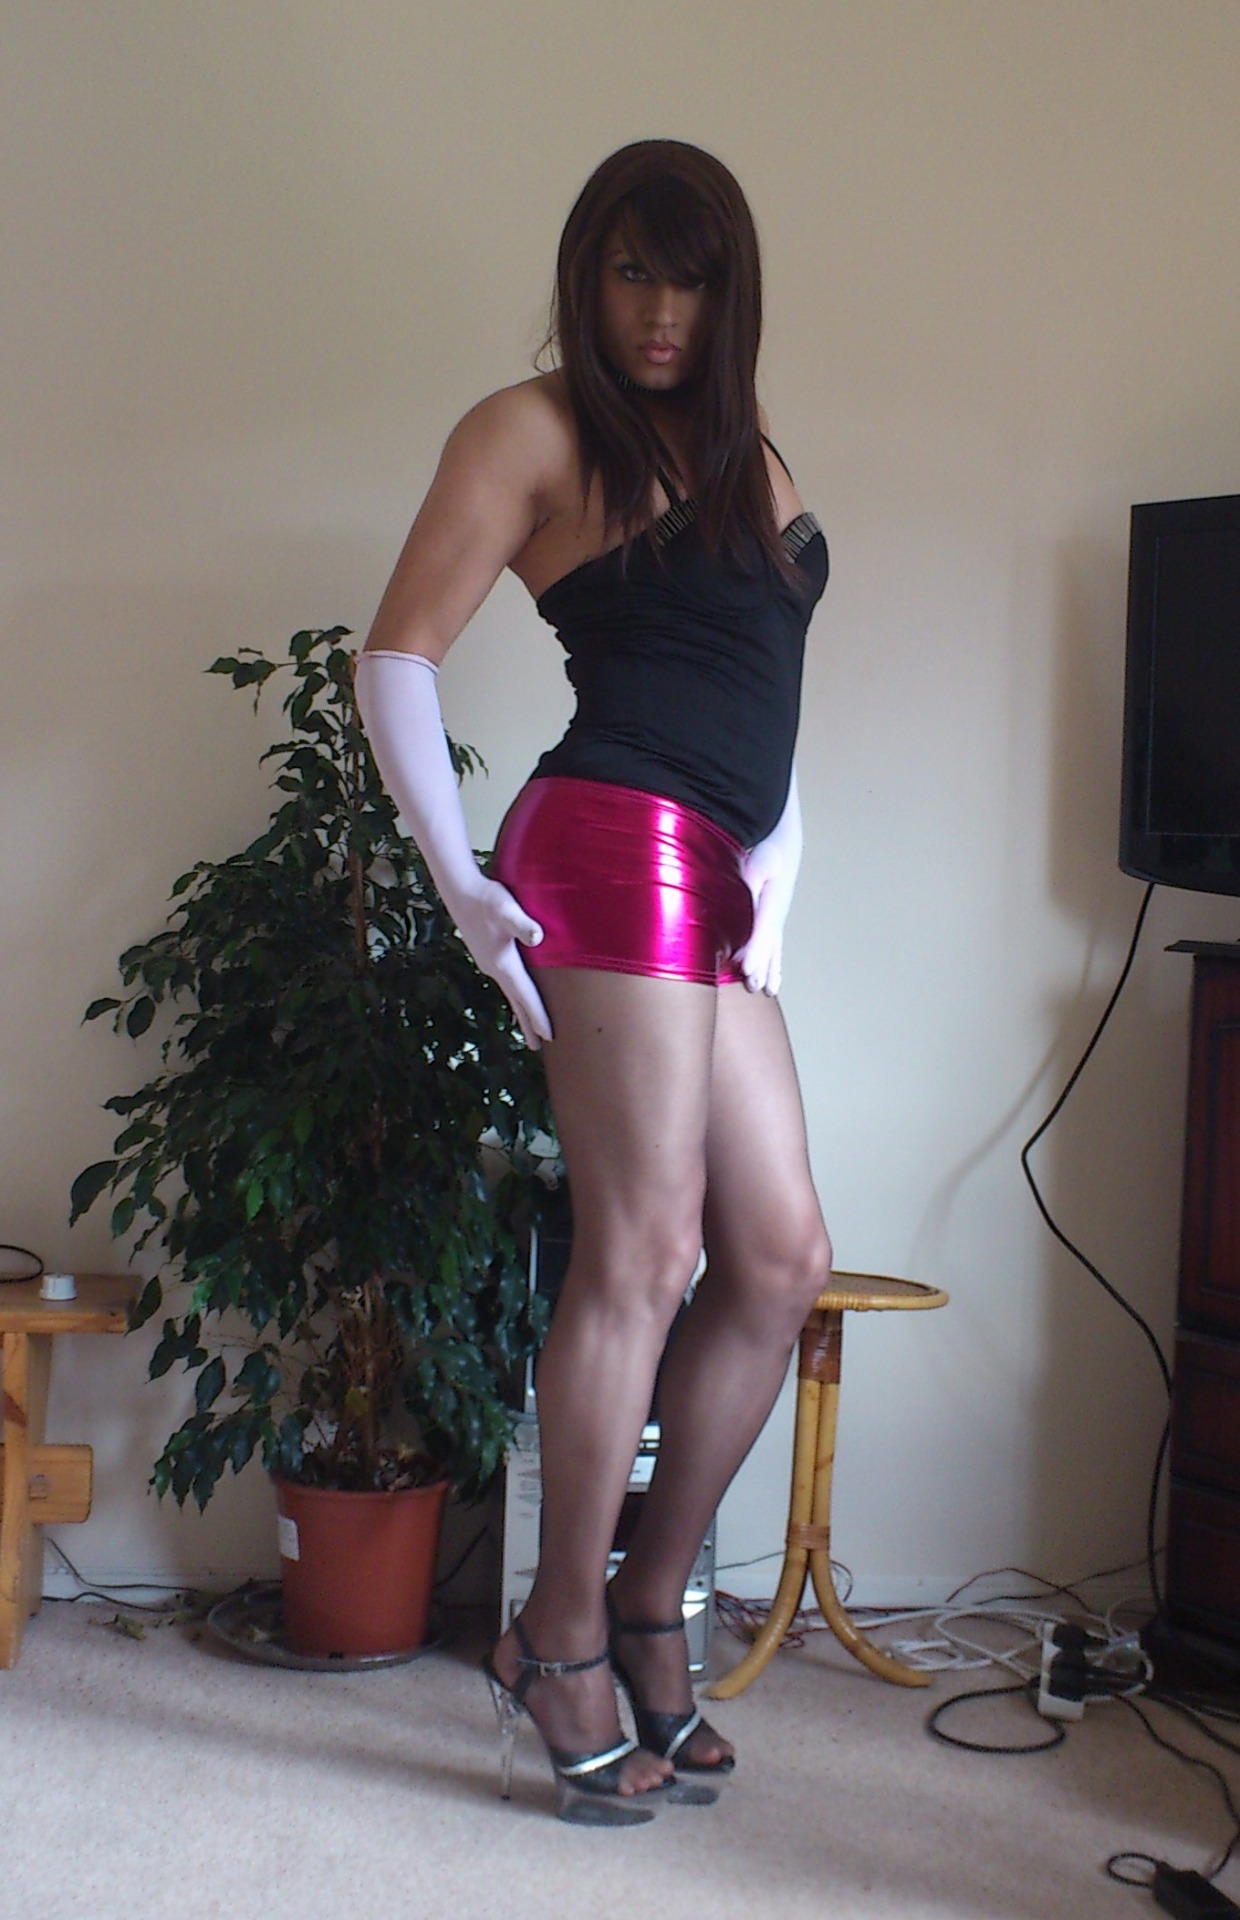 www. Emily procter . nude . com